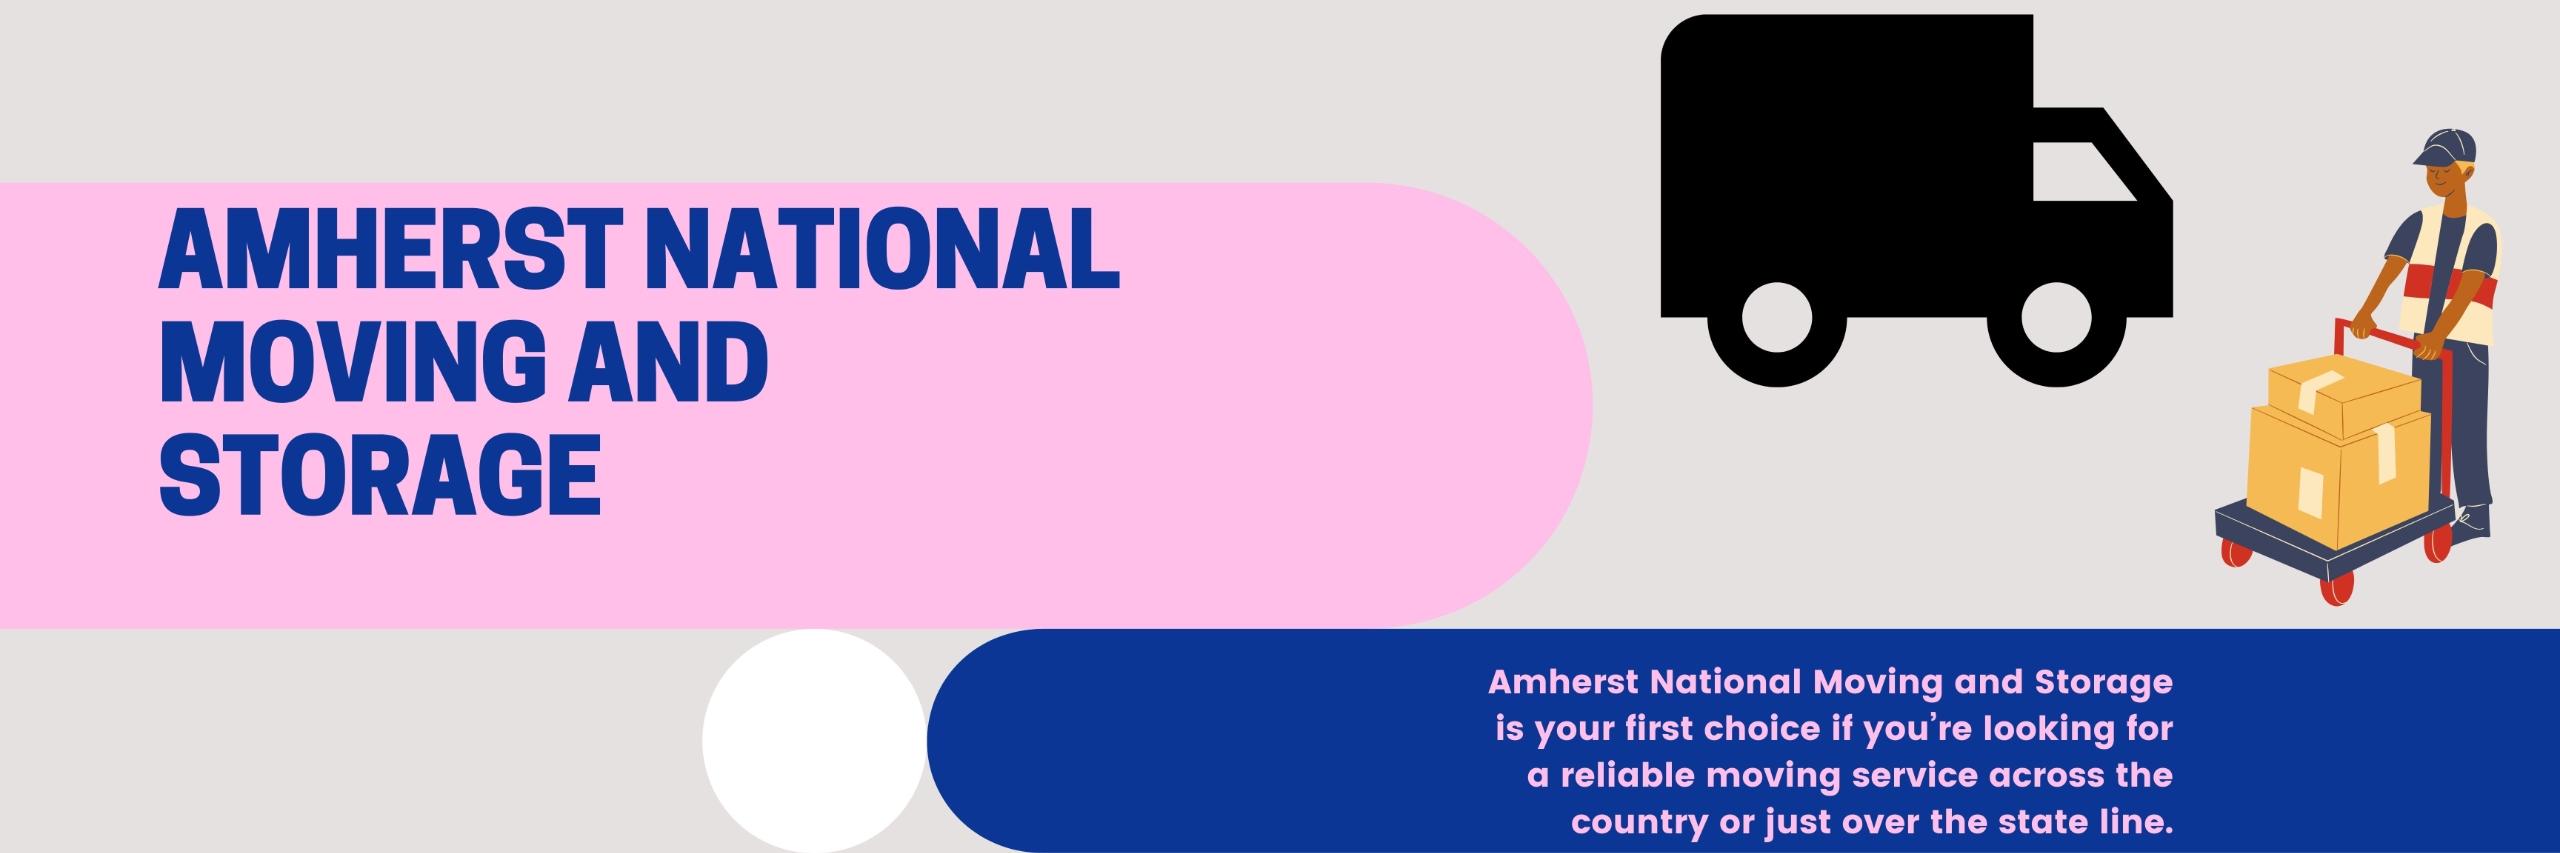 Amherst National Moving and Storage (@amherstnationalmovingandstorage) Cover Image